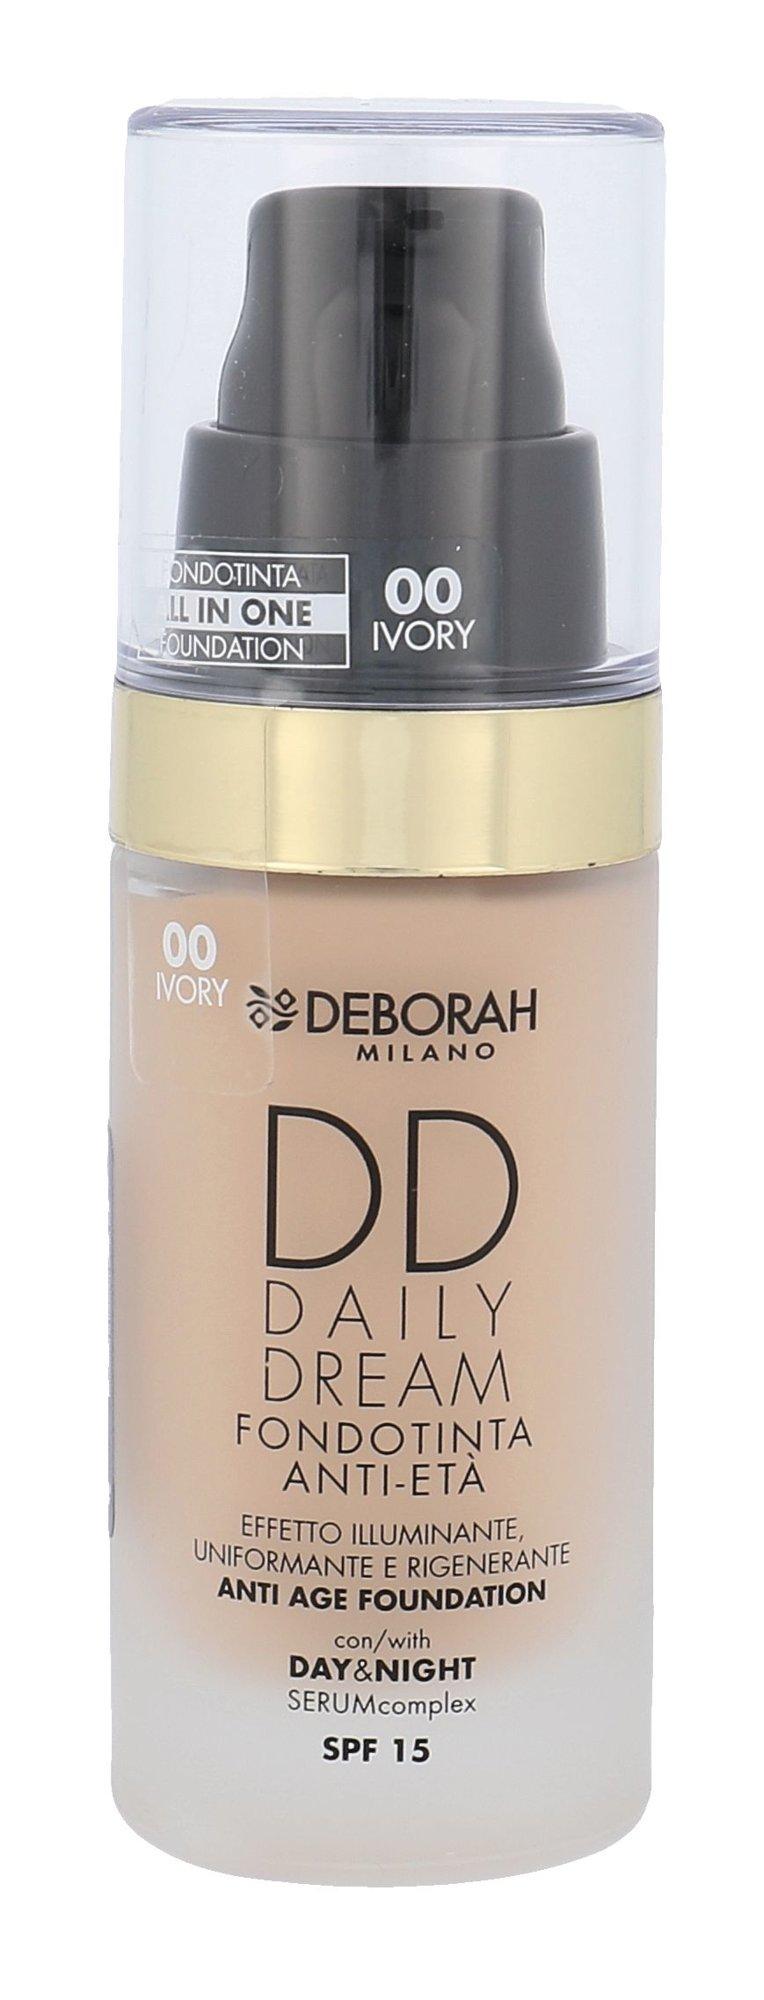 Deborah Milano DD Daily Dream Cosmetic 30ml 00 Ivory